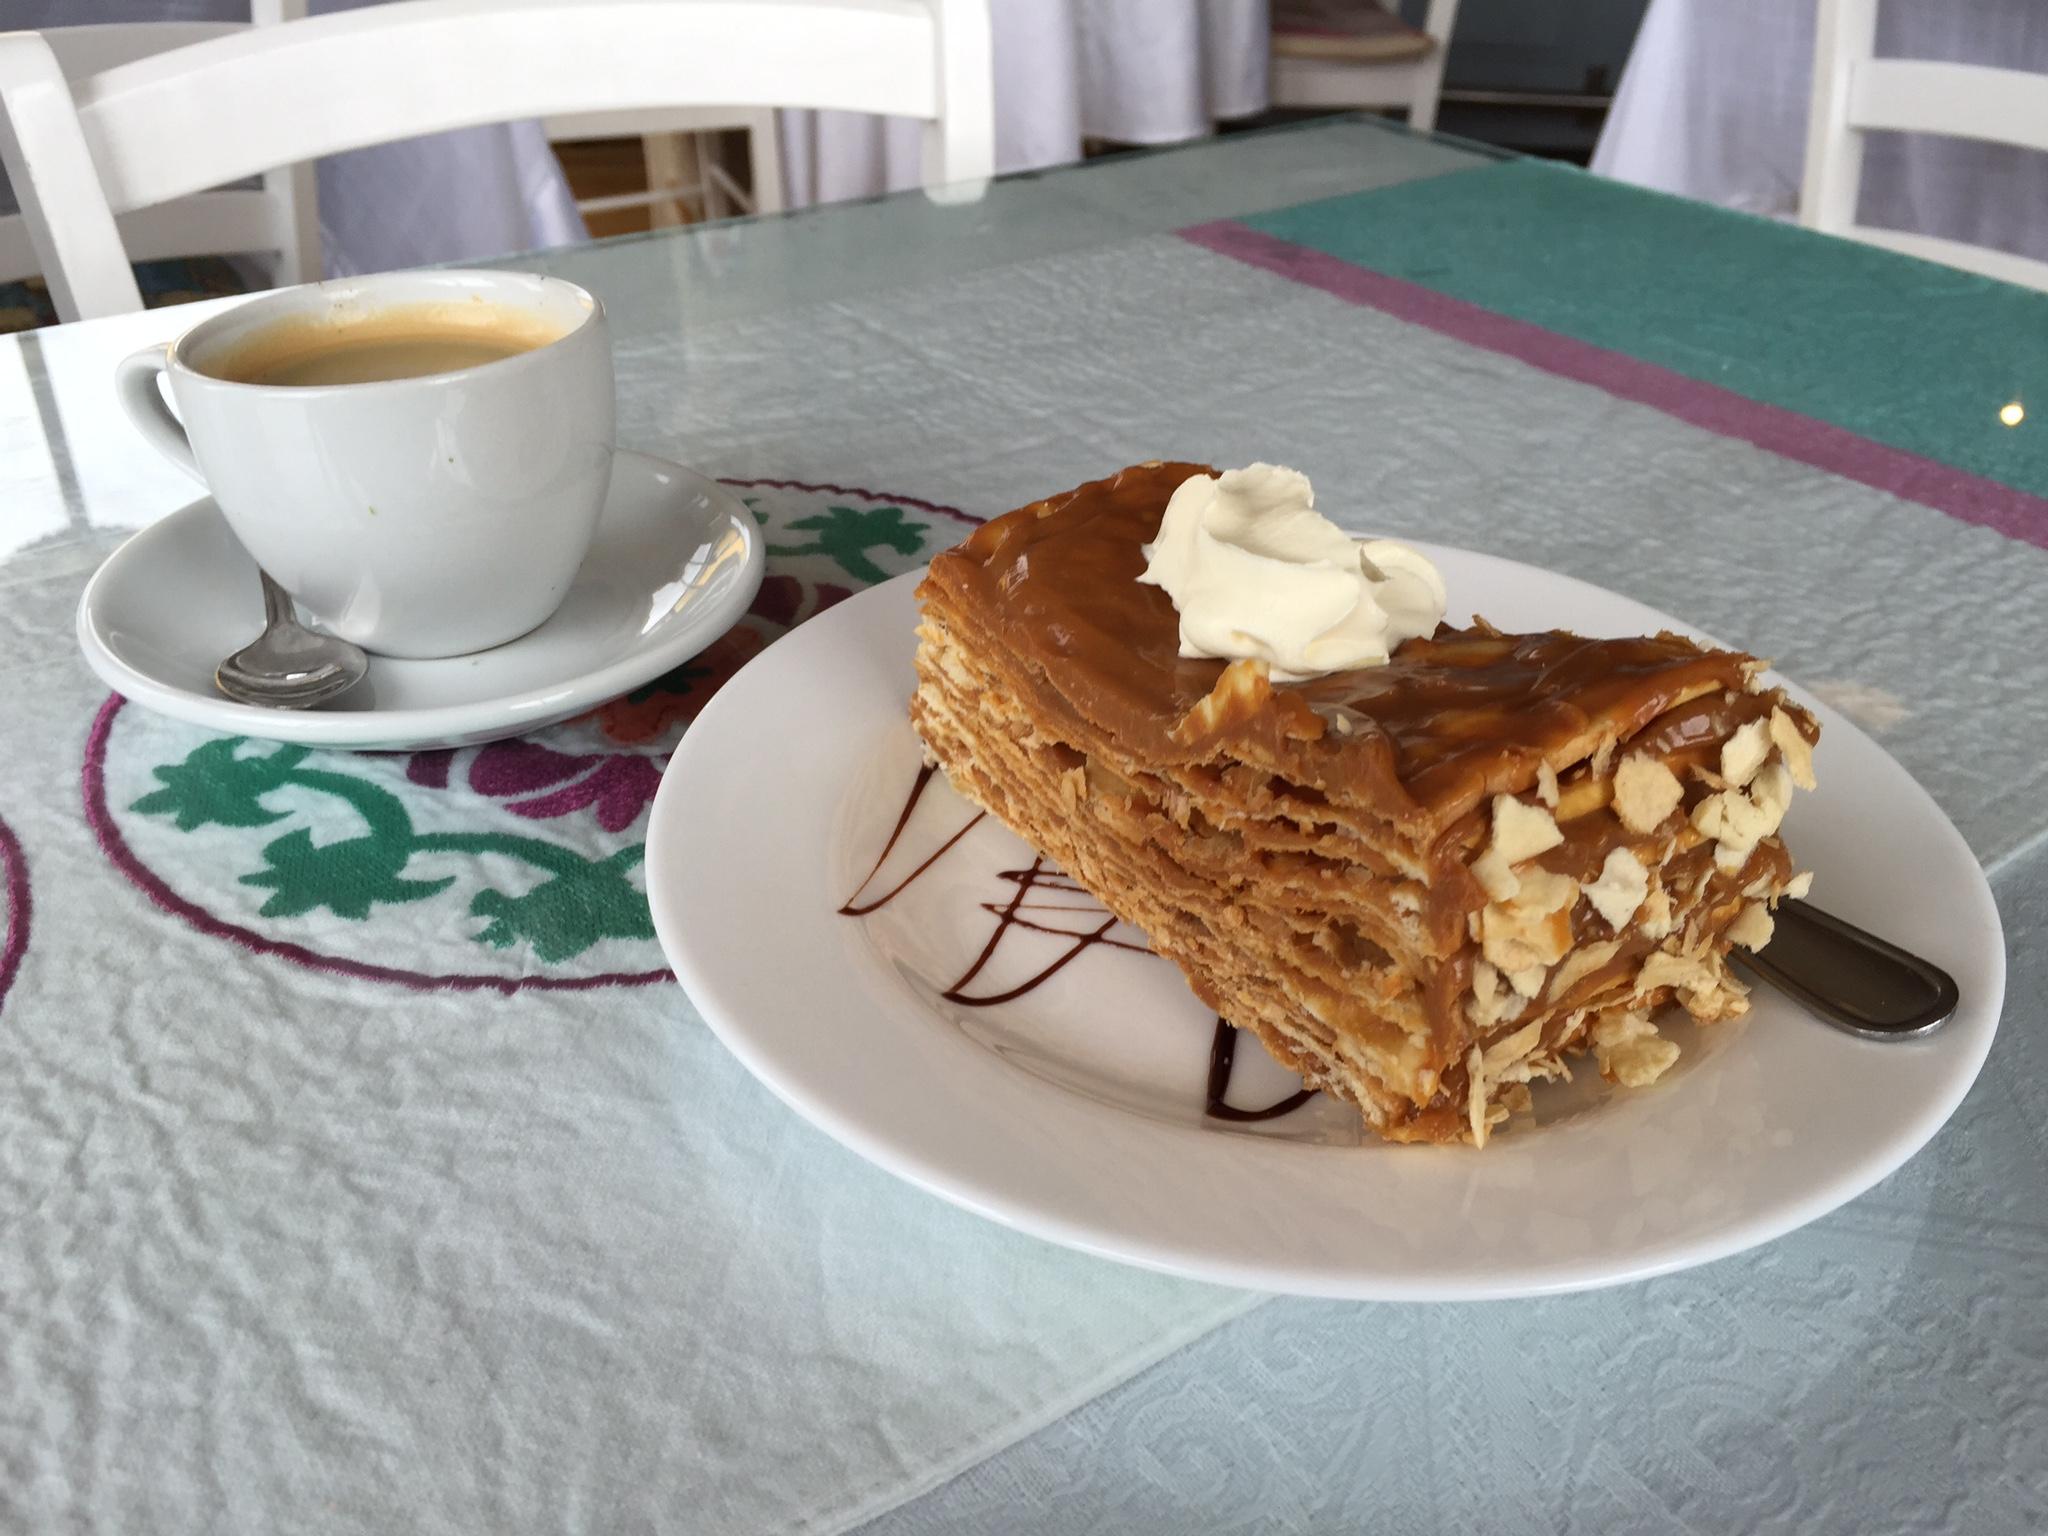 Yvonderweg - Eten in Chili - de lokale keuken - Milhojas